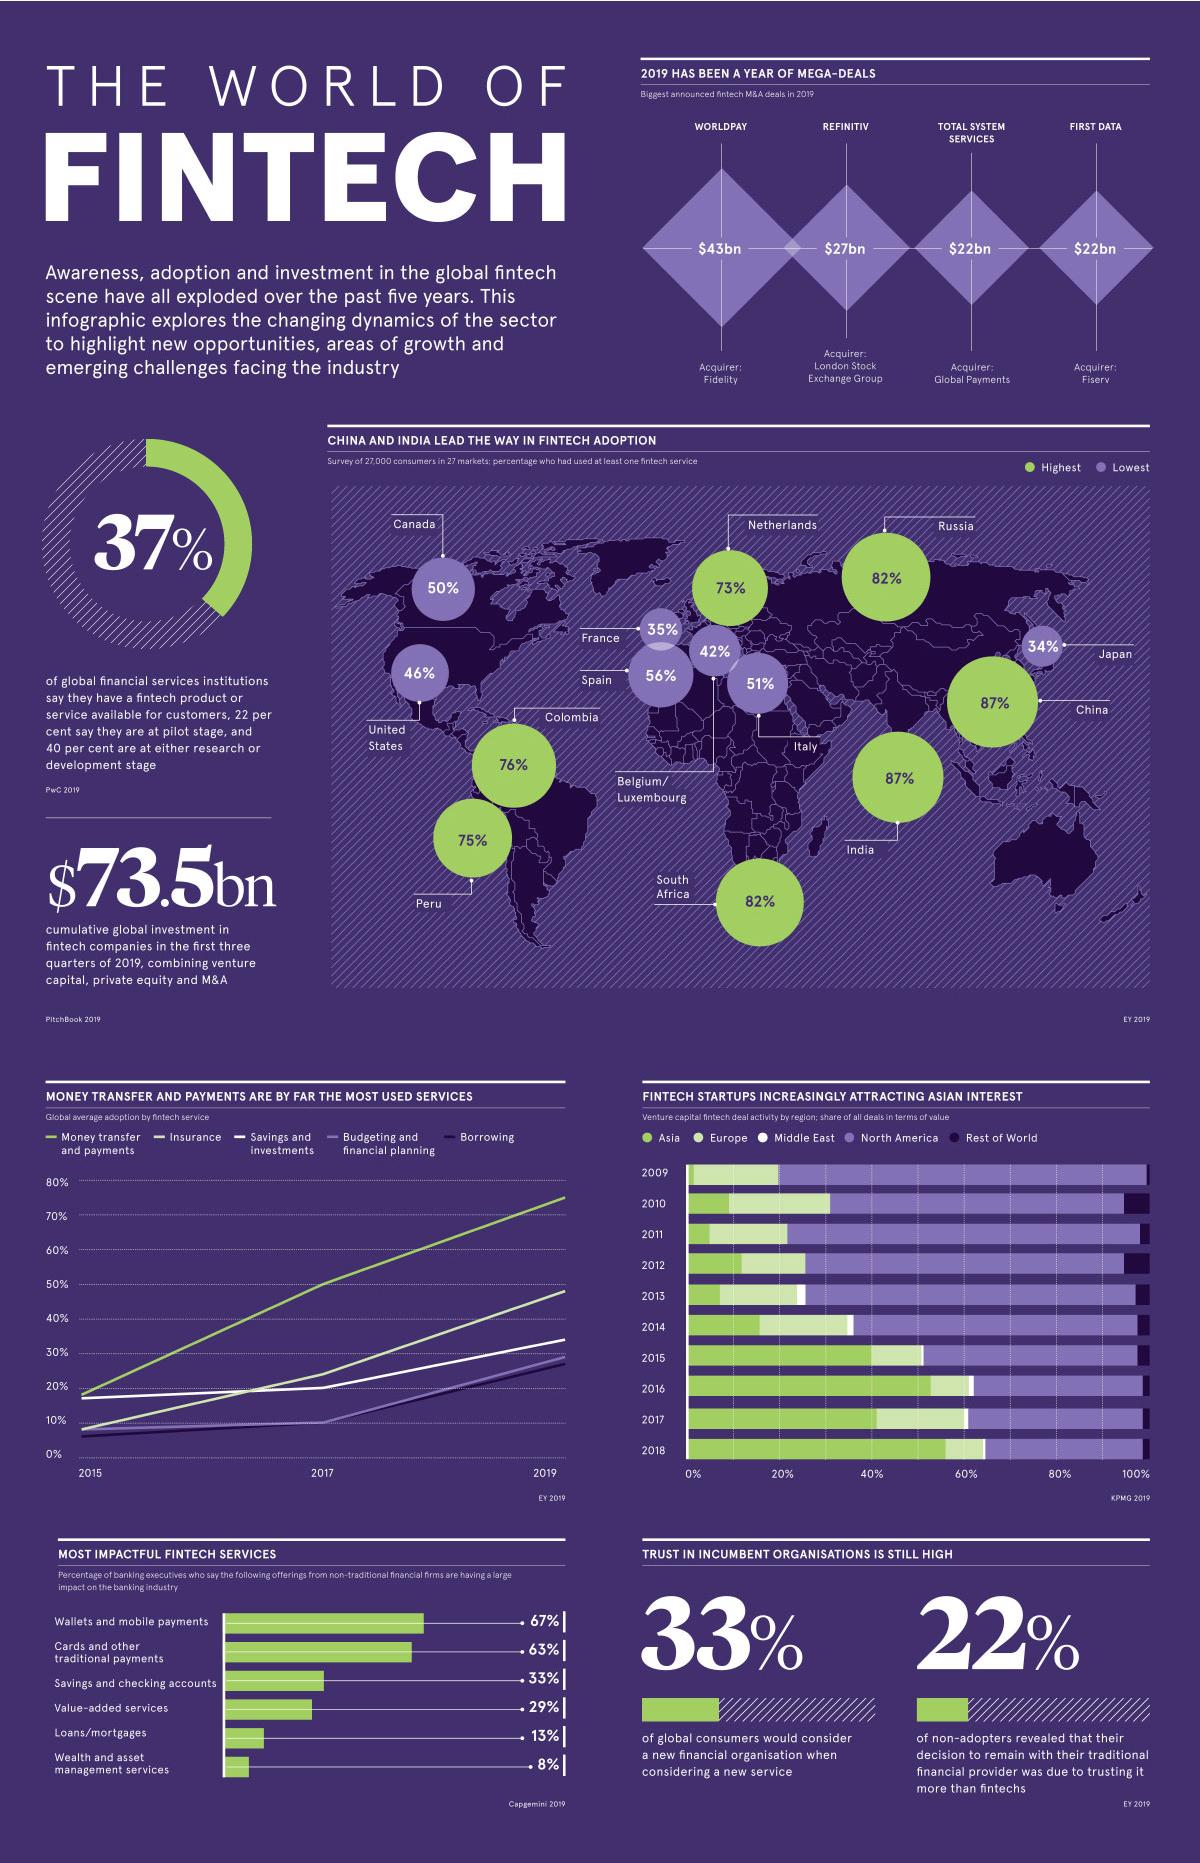 visualizing the world of fintech